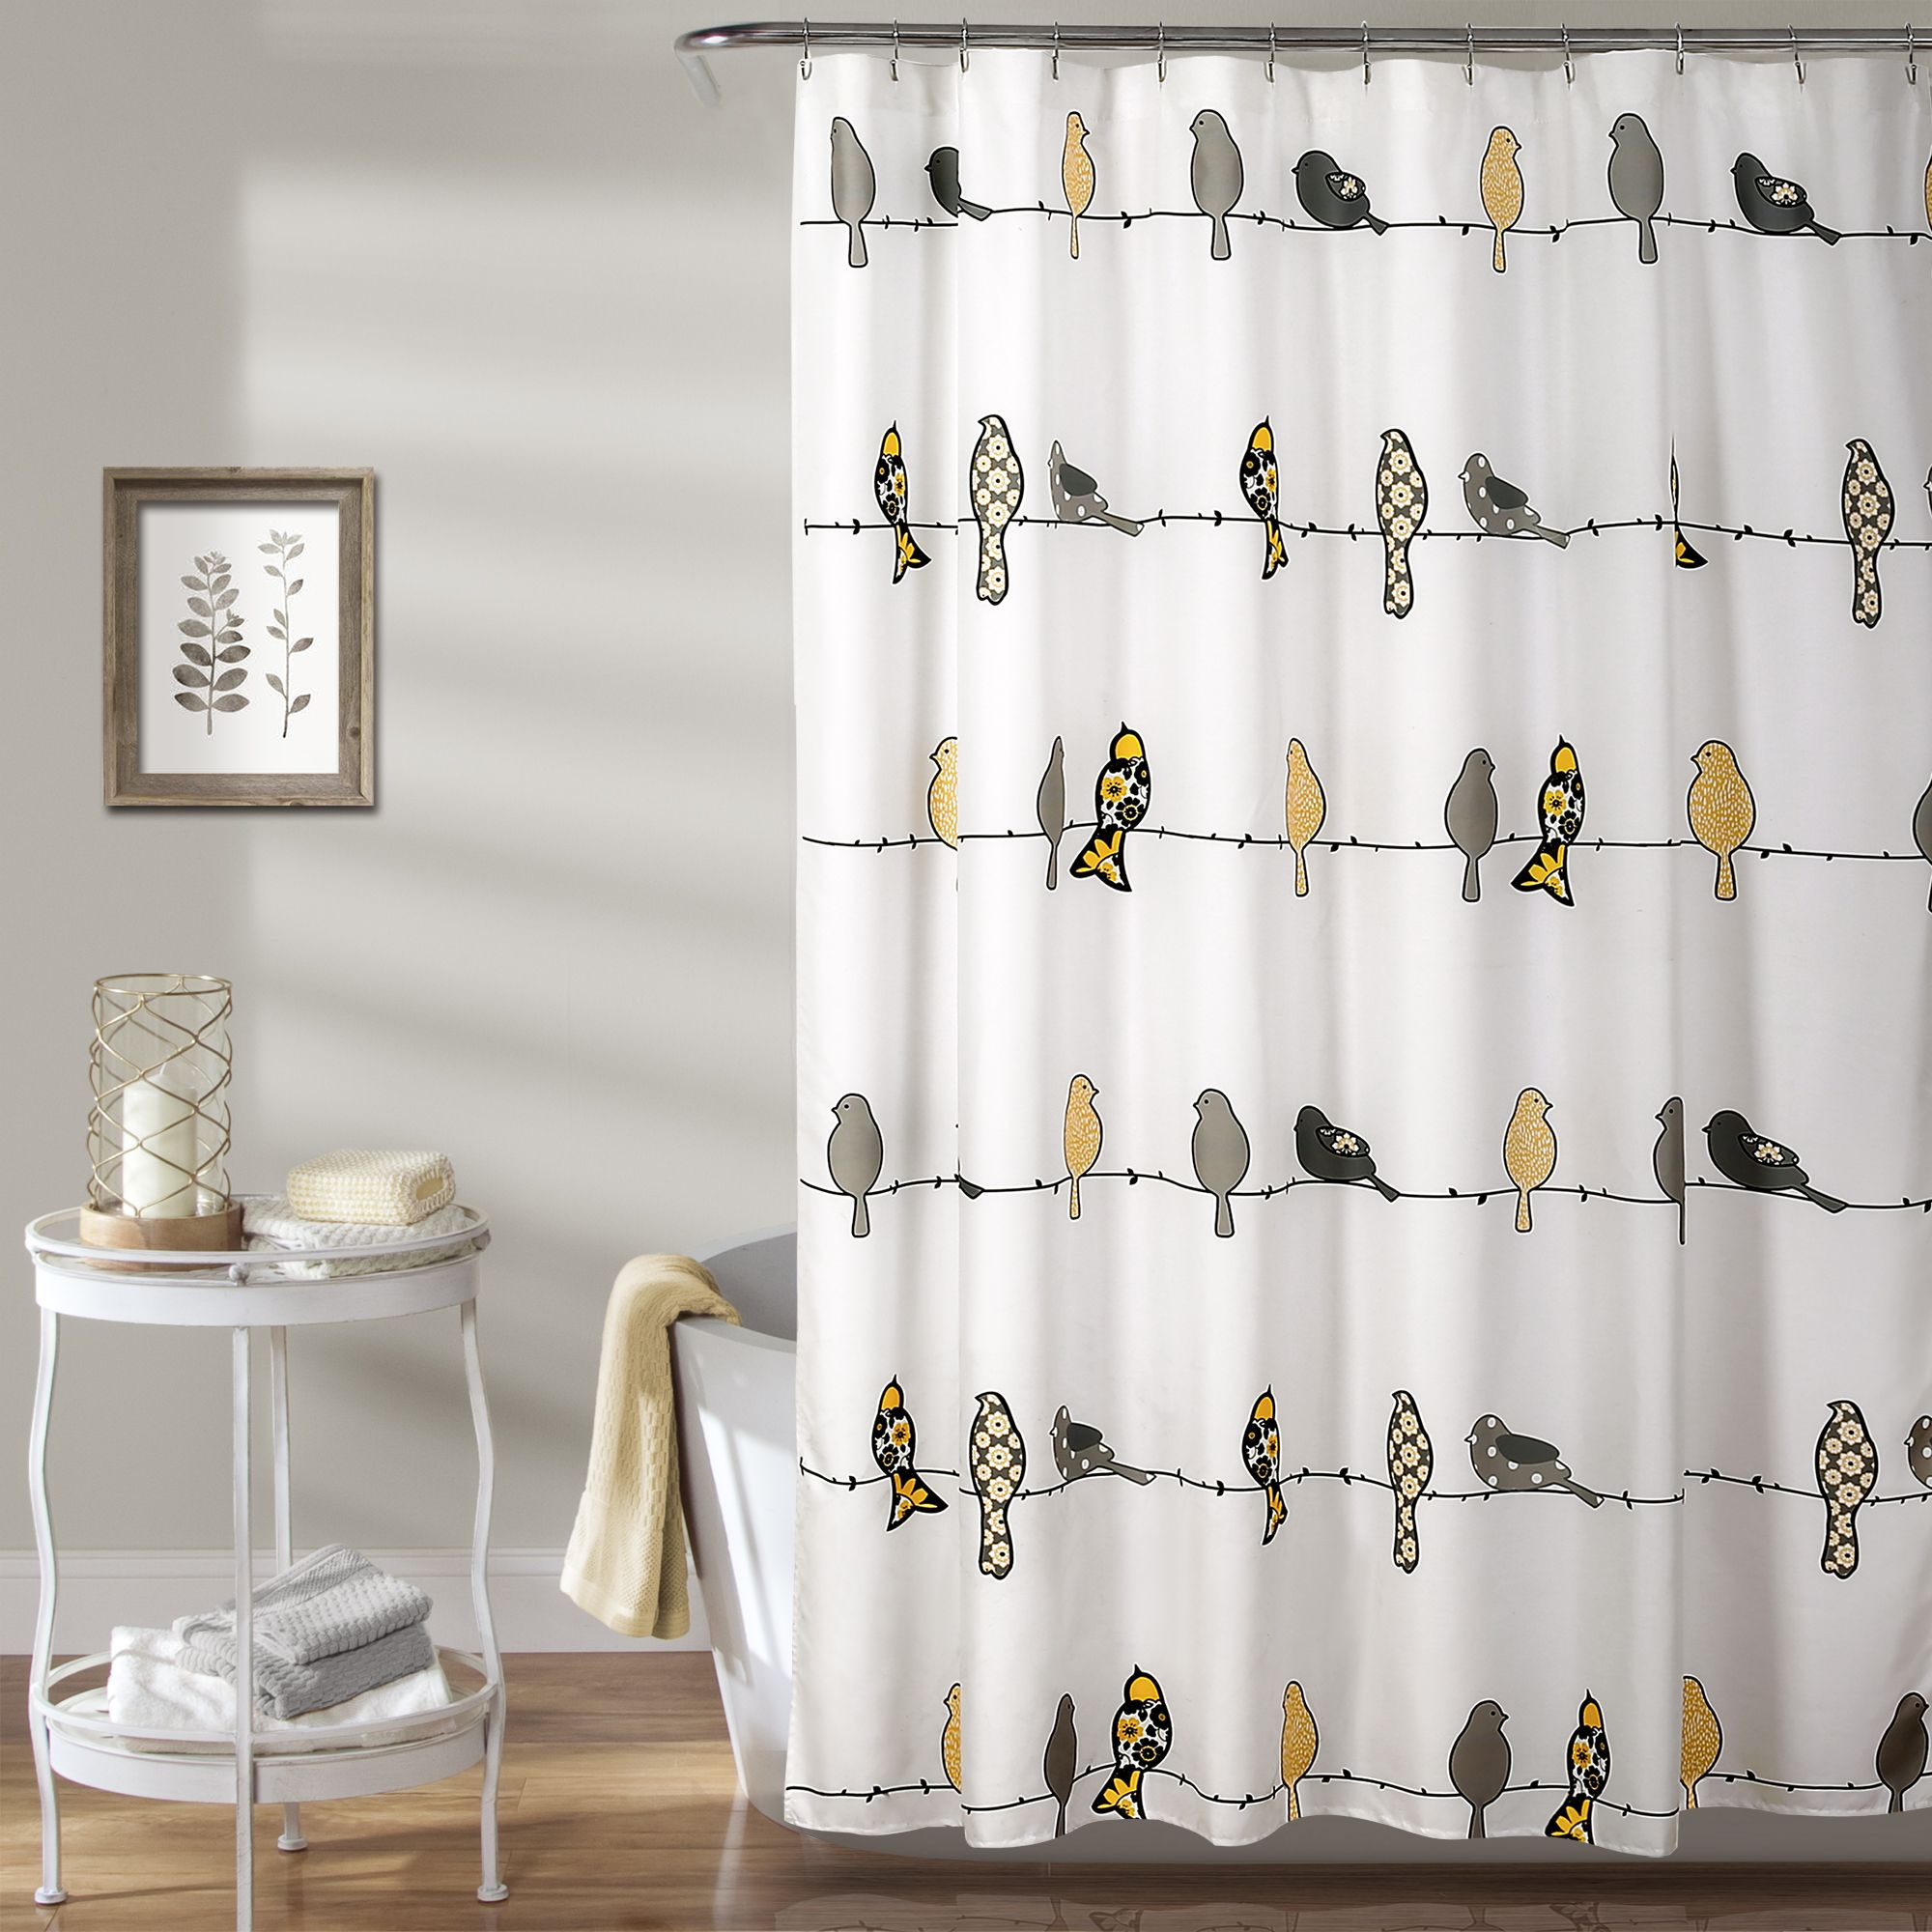 Rowley Birds Shower Curtain Bird Shower Curtain Curtains Guest